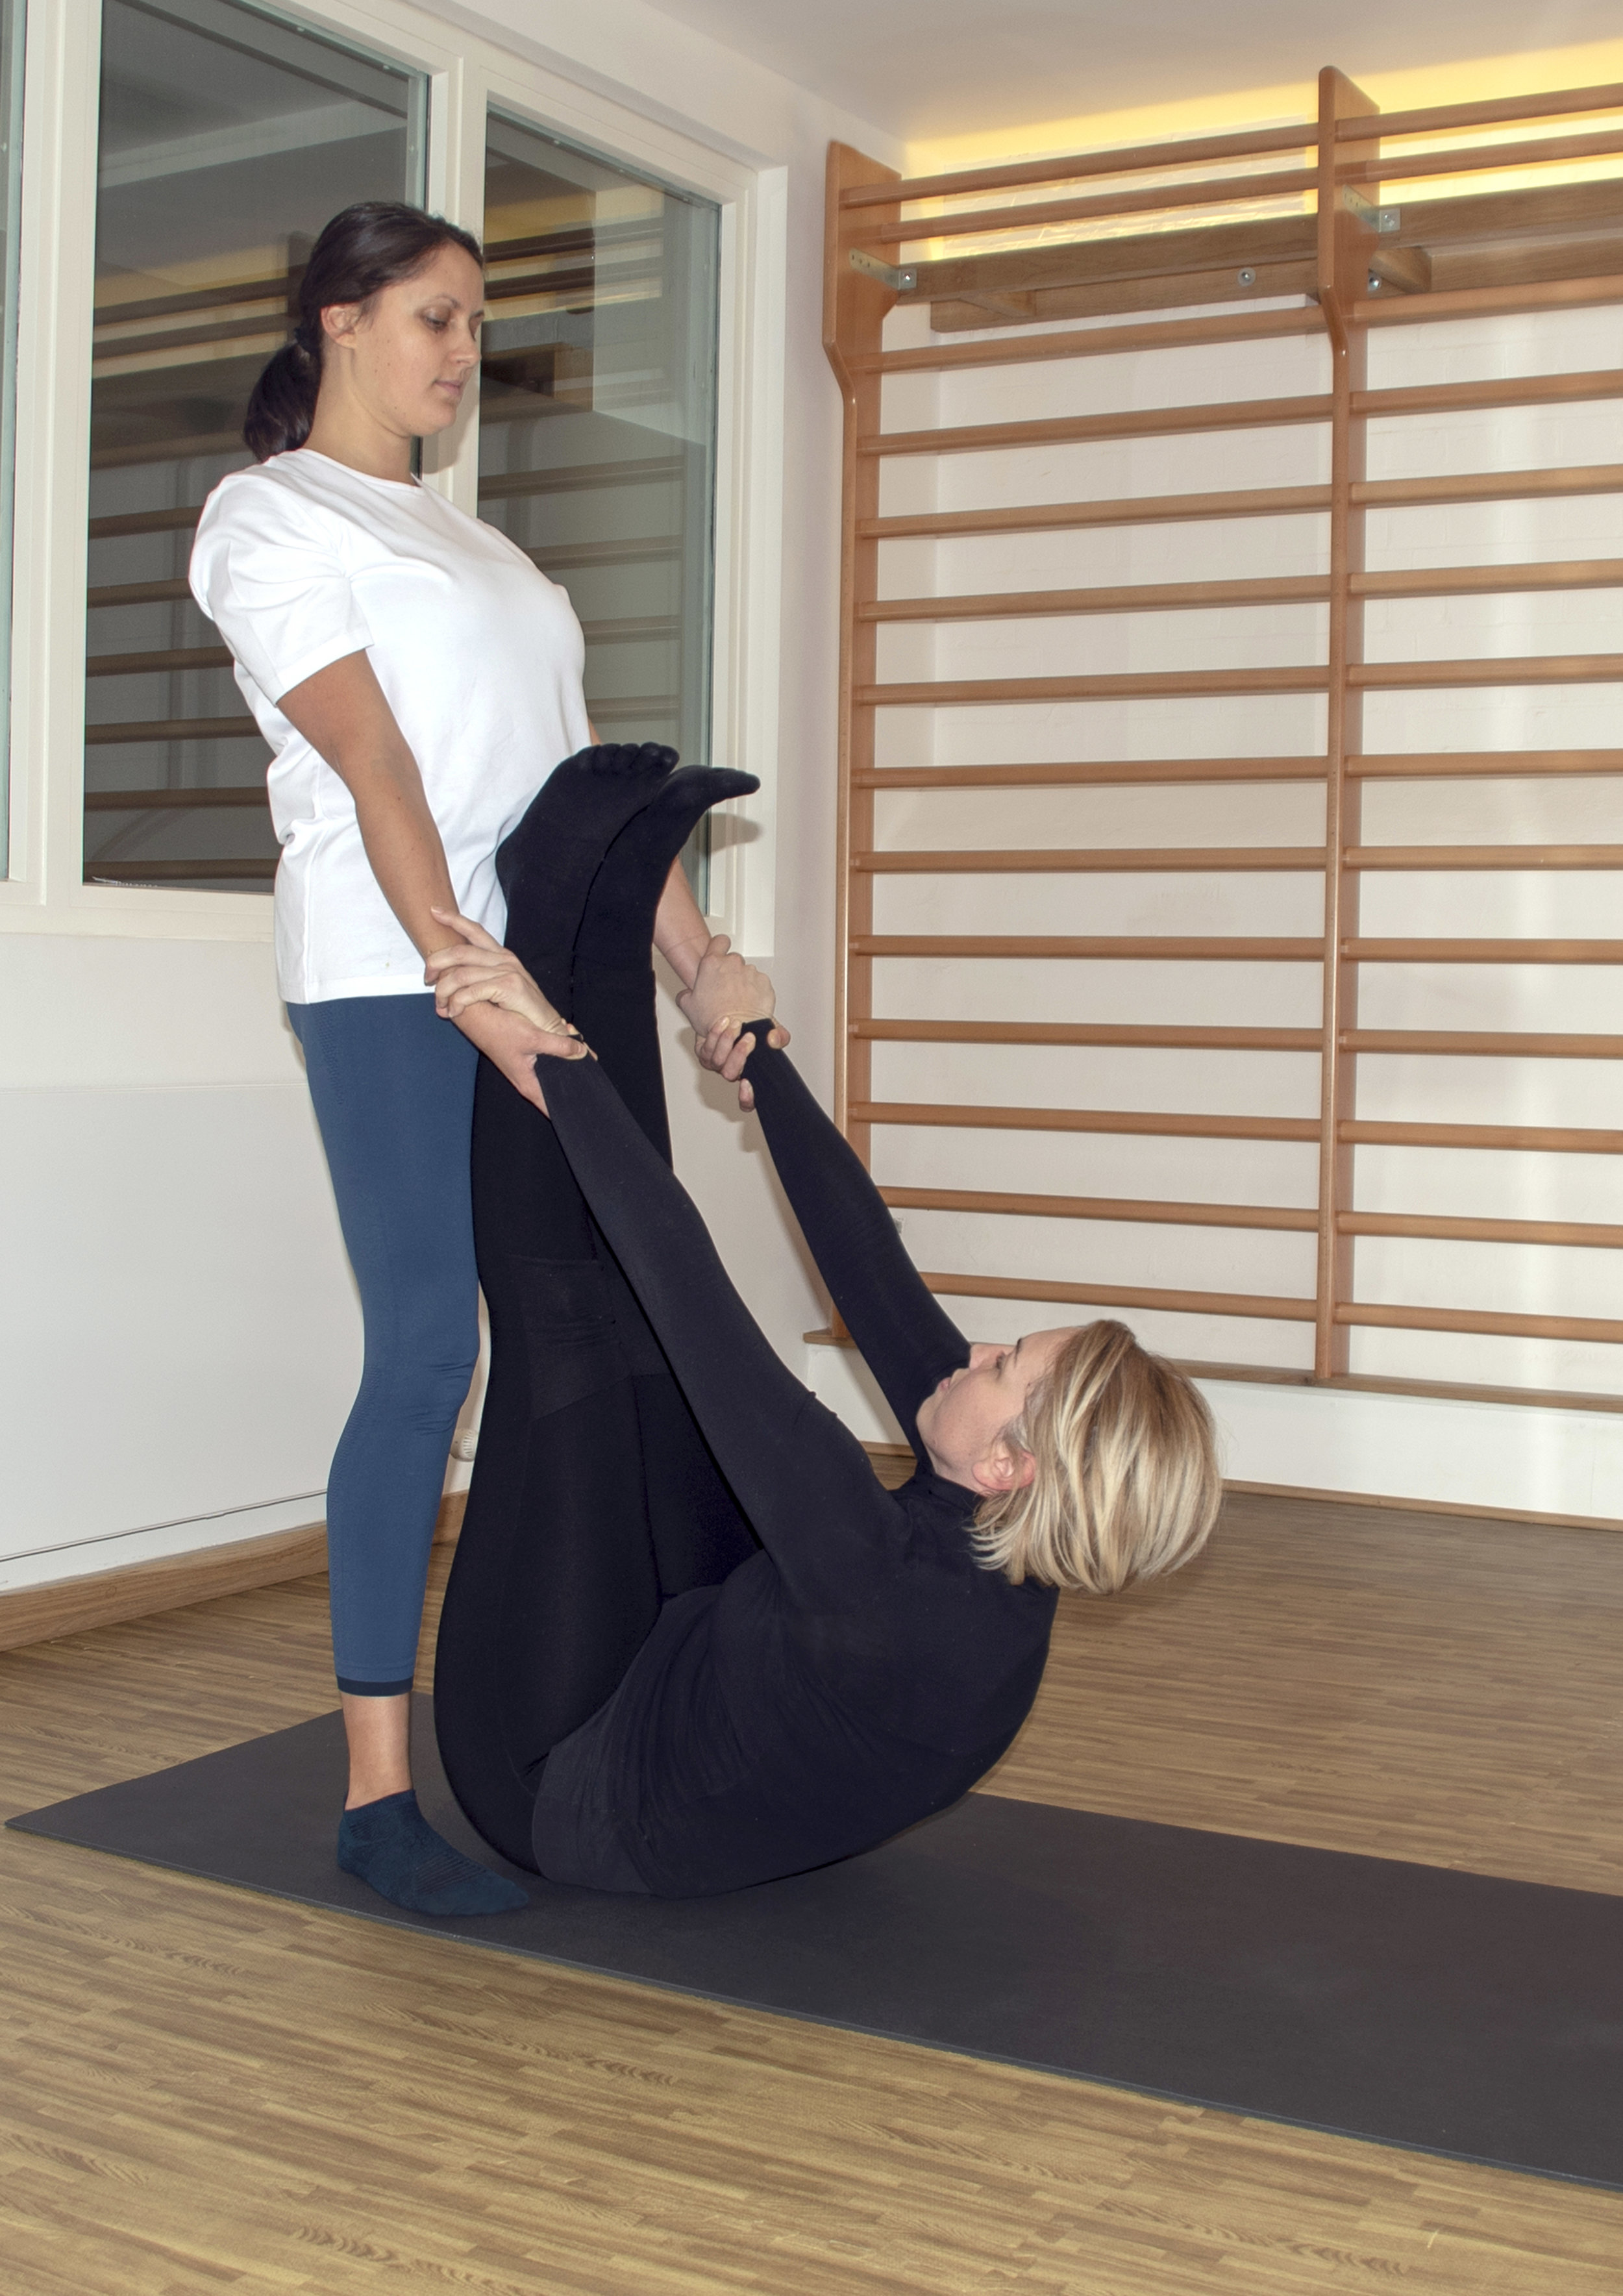 Thai Yoga Massage - Stretching